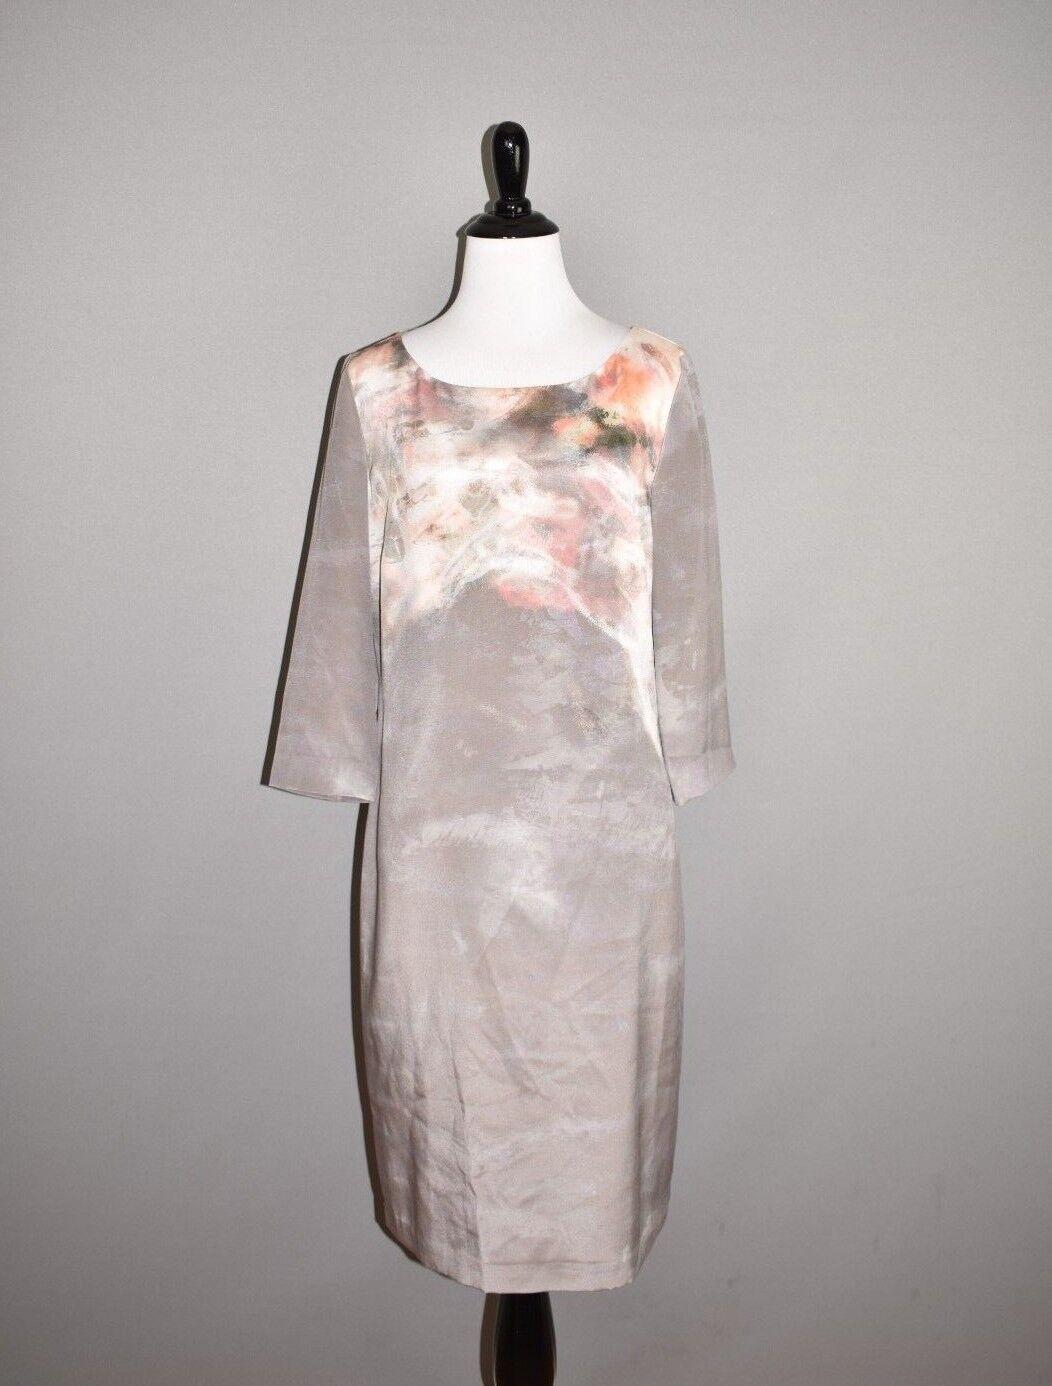 ST. JOHN NEW  995 Slate Cream Silk Shift Dress 3 4 Sleeves Size 6